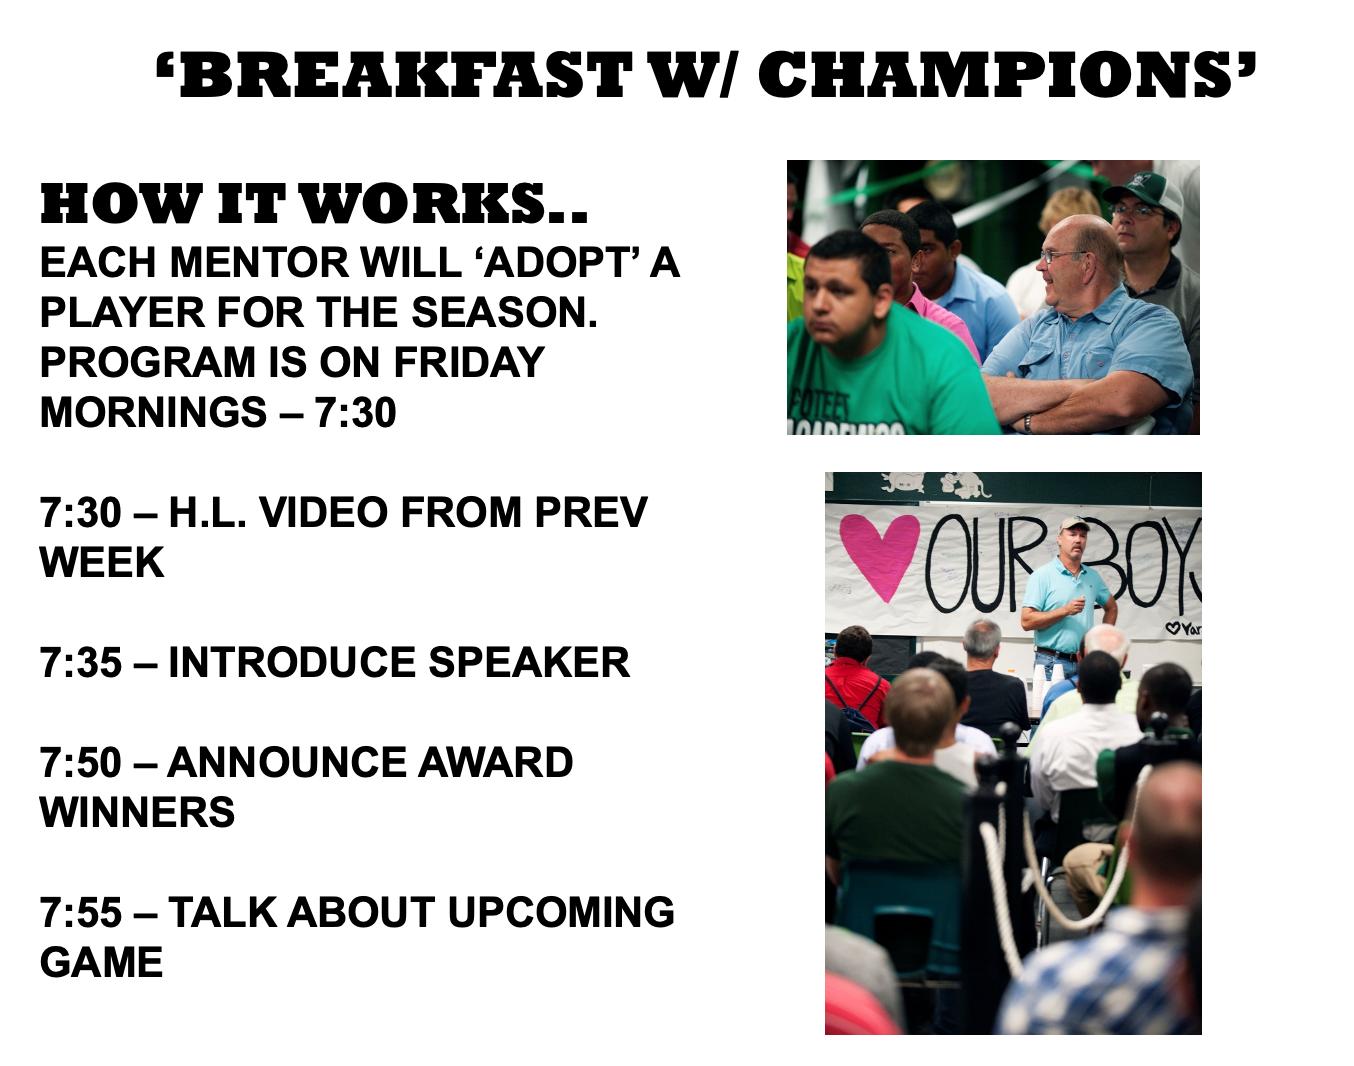 VIDEO - BREAKFAST W/ CHAMPIONS MENTOR PROGRAM